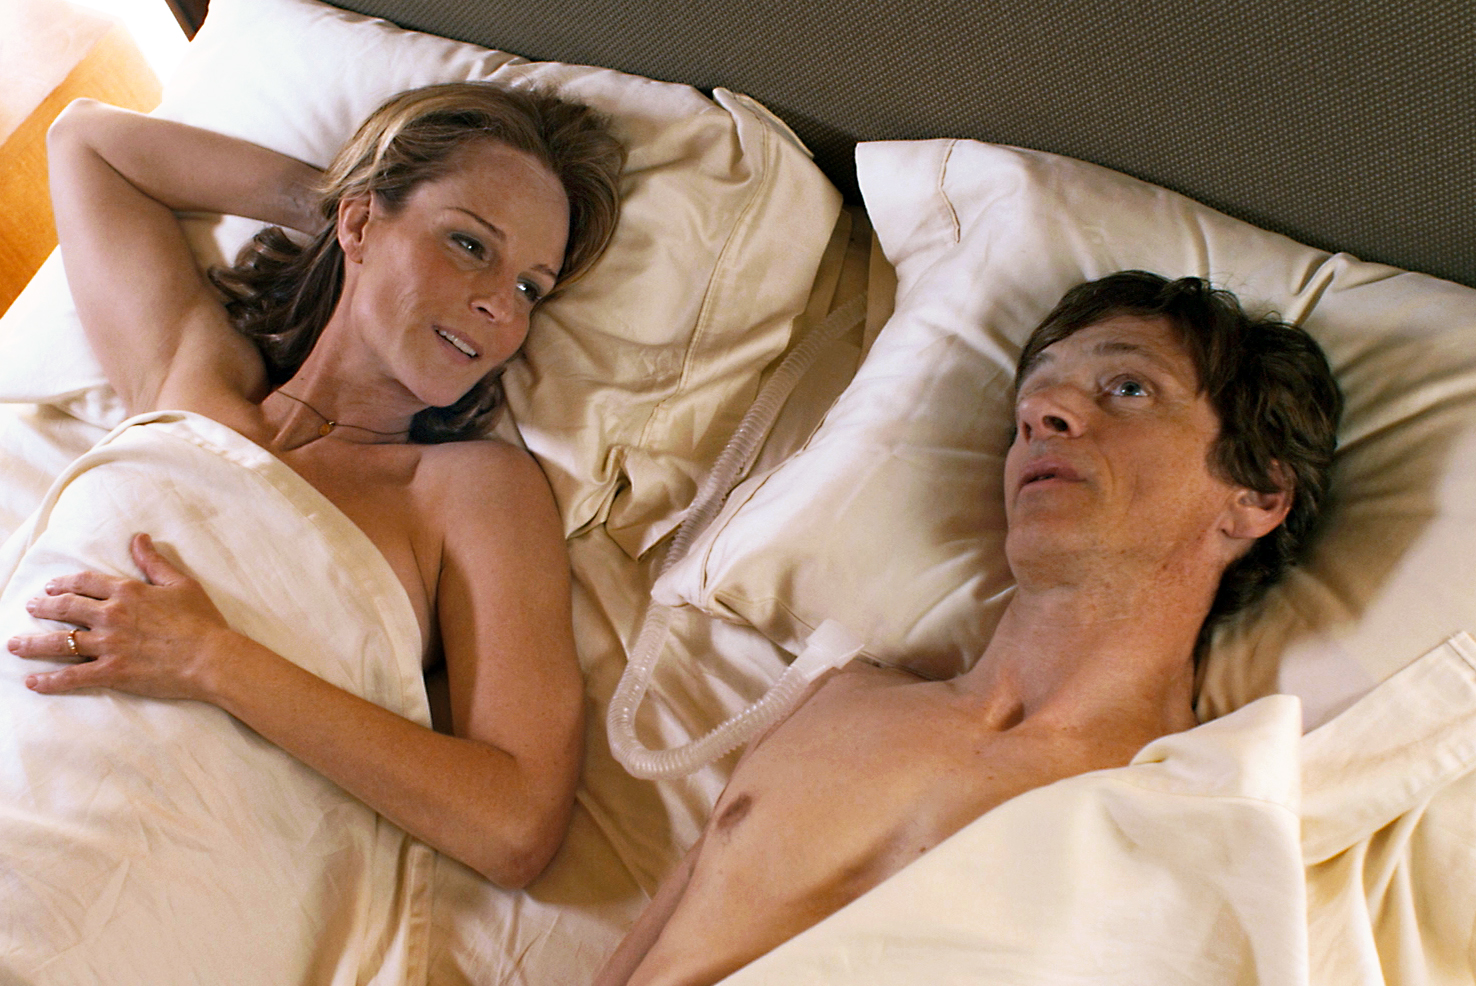 Cheryl e Mark finalmente a letto insieme